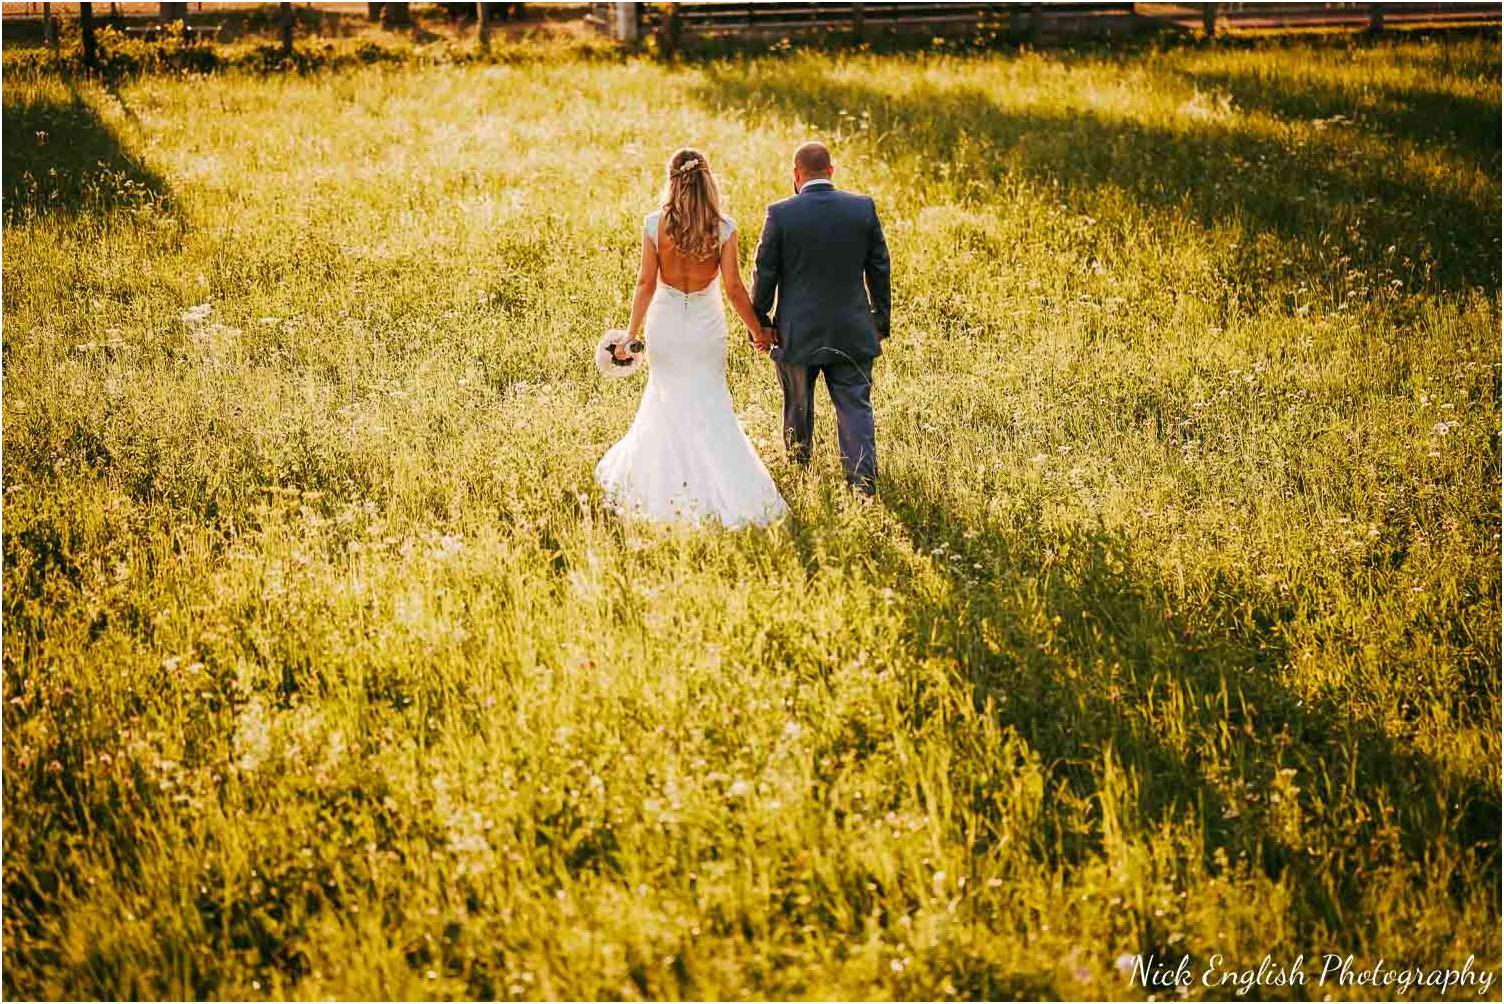 Destination_Wedding_Photographer_Slovenia_Nick_English_Photography-70-35.jpg